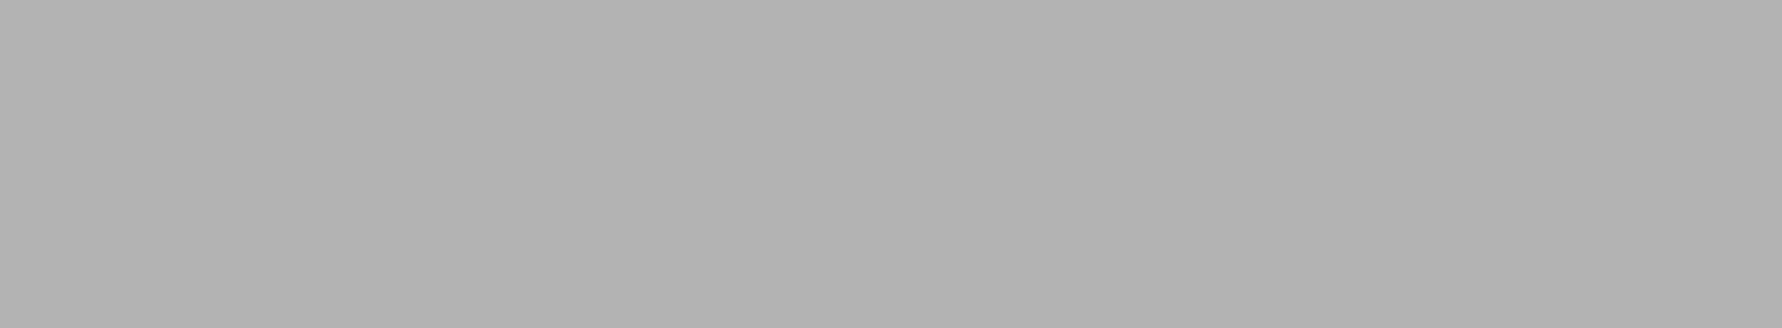 curve_line